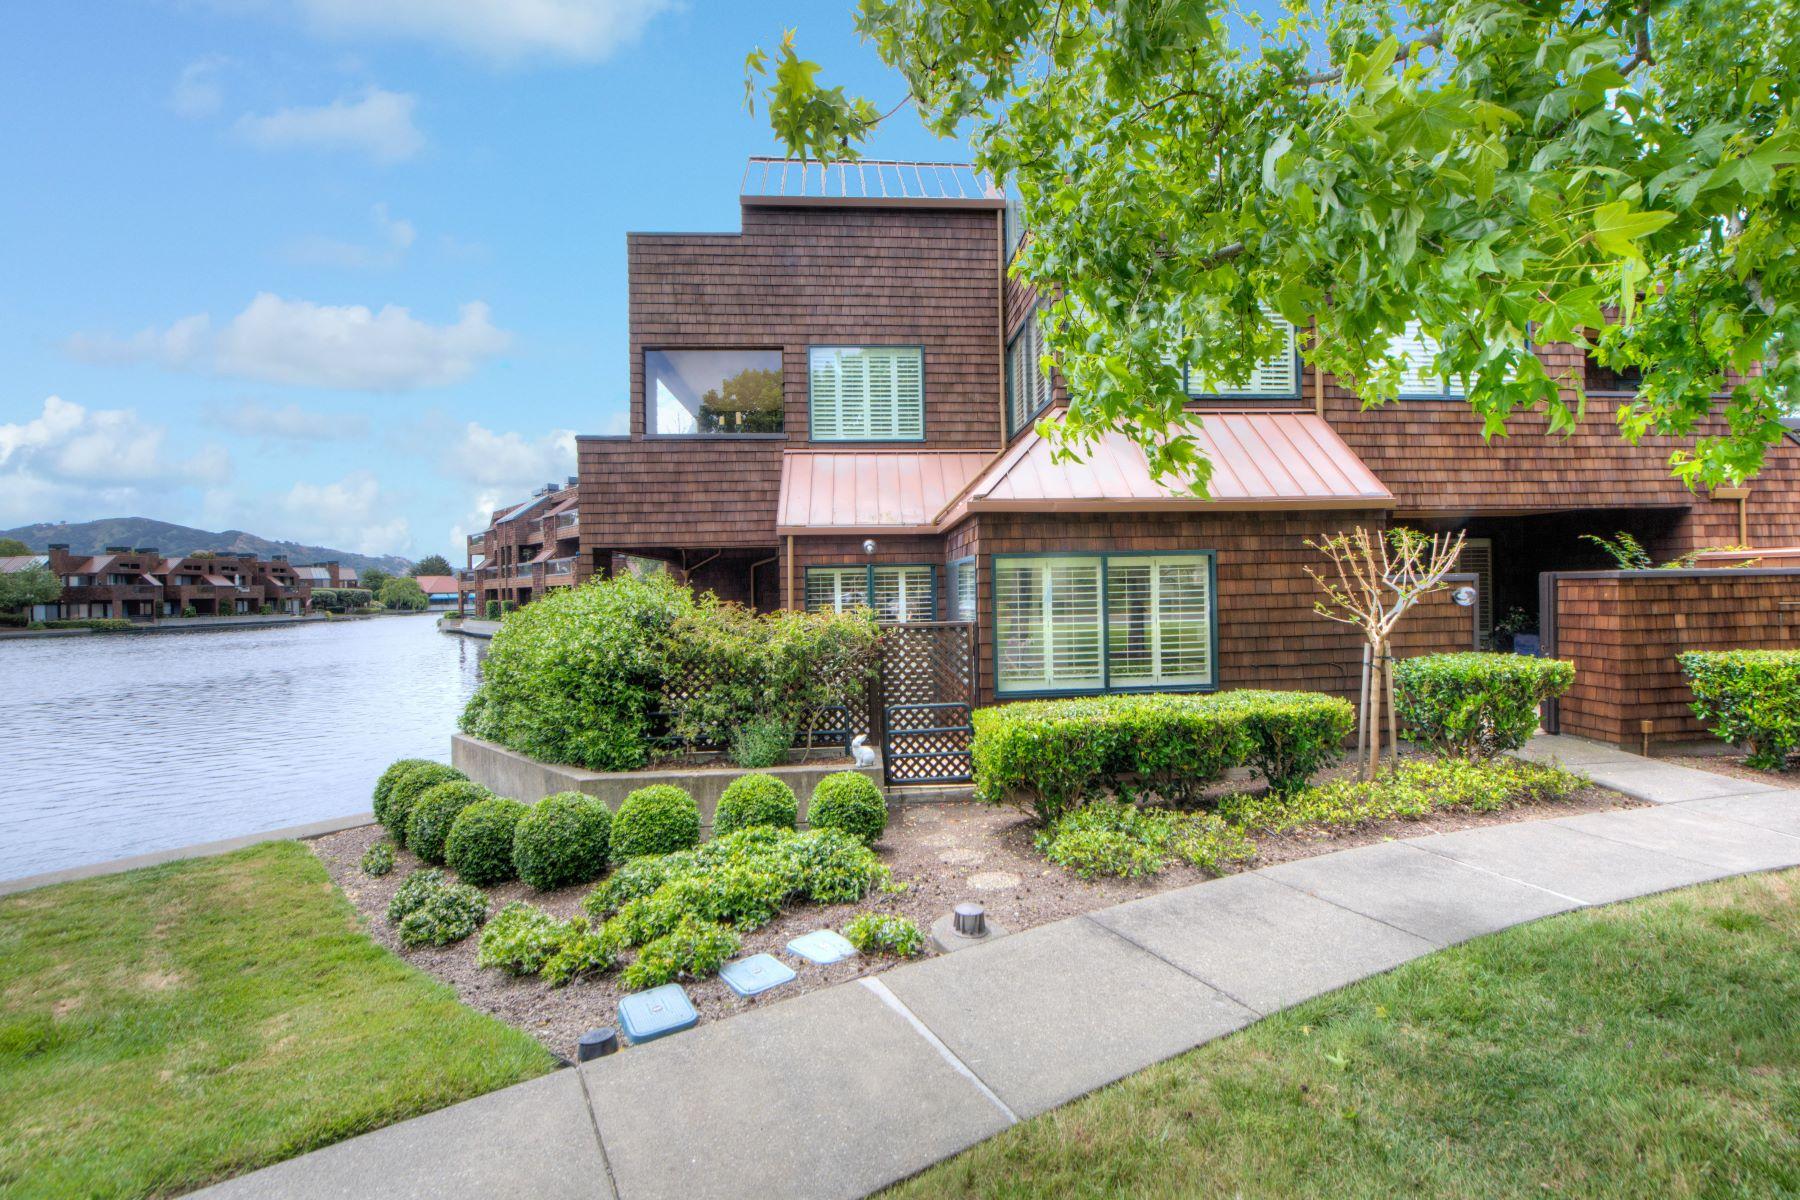 Single Family Home for Sale at Simply Exquisite...Overlooking Point Tiburon Lagoon 18 Lagoon Vista Road Tiburon, California, 94920 United States